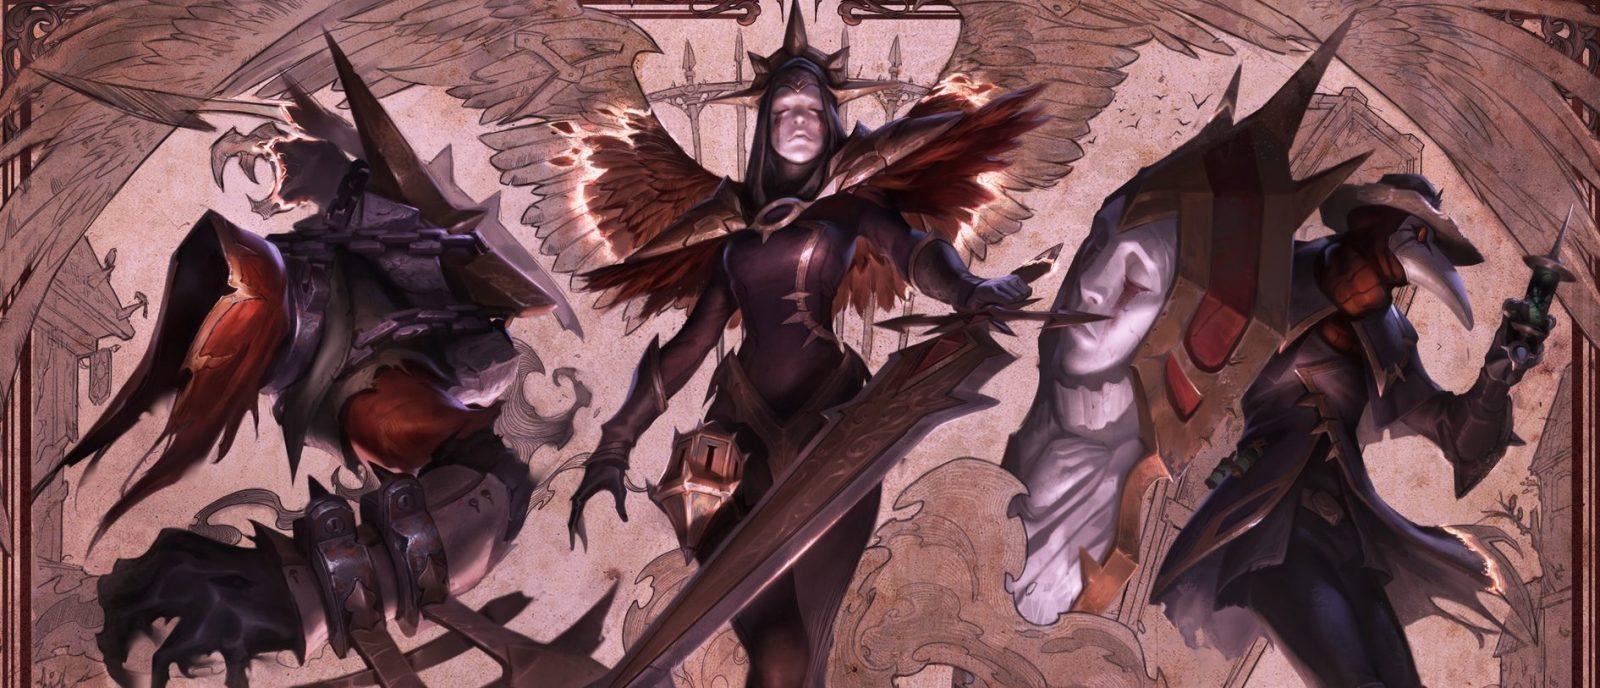 Iron Inquisitor Kayle | Buy League of Legends Skin - SmurfMania.com